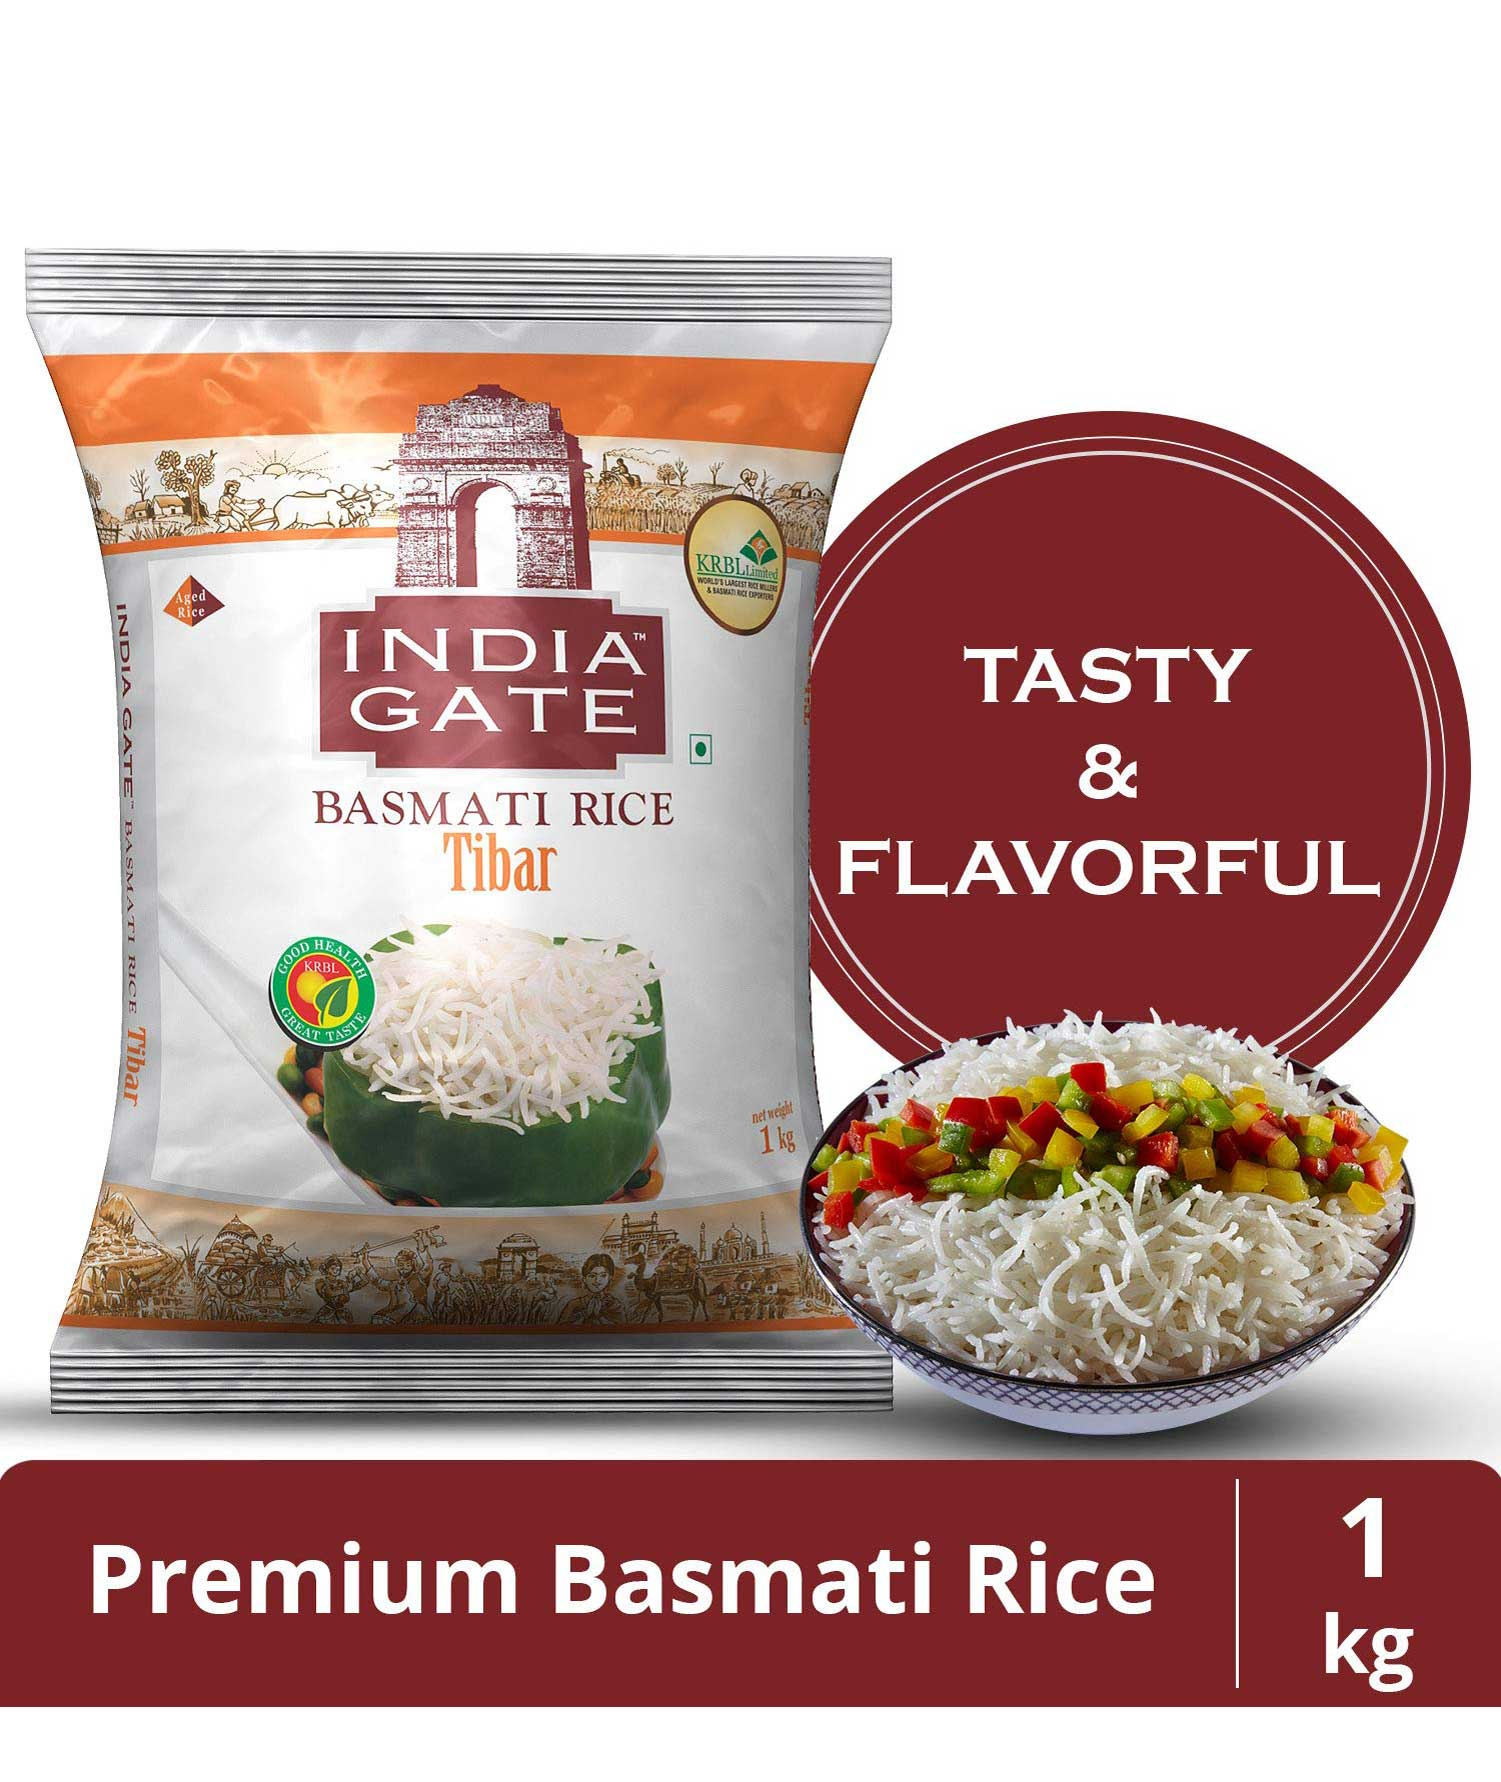 India Gate Basmati Rice Tibar, 1kg